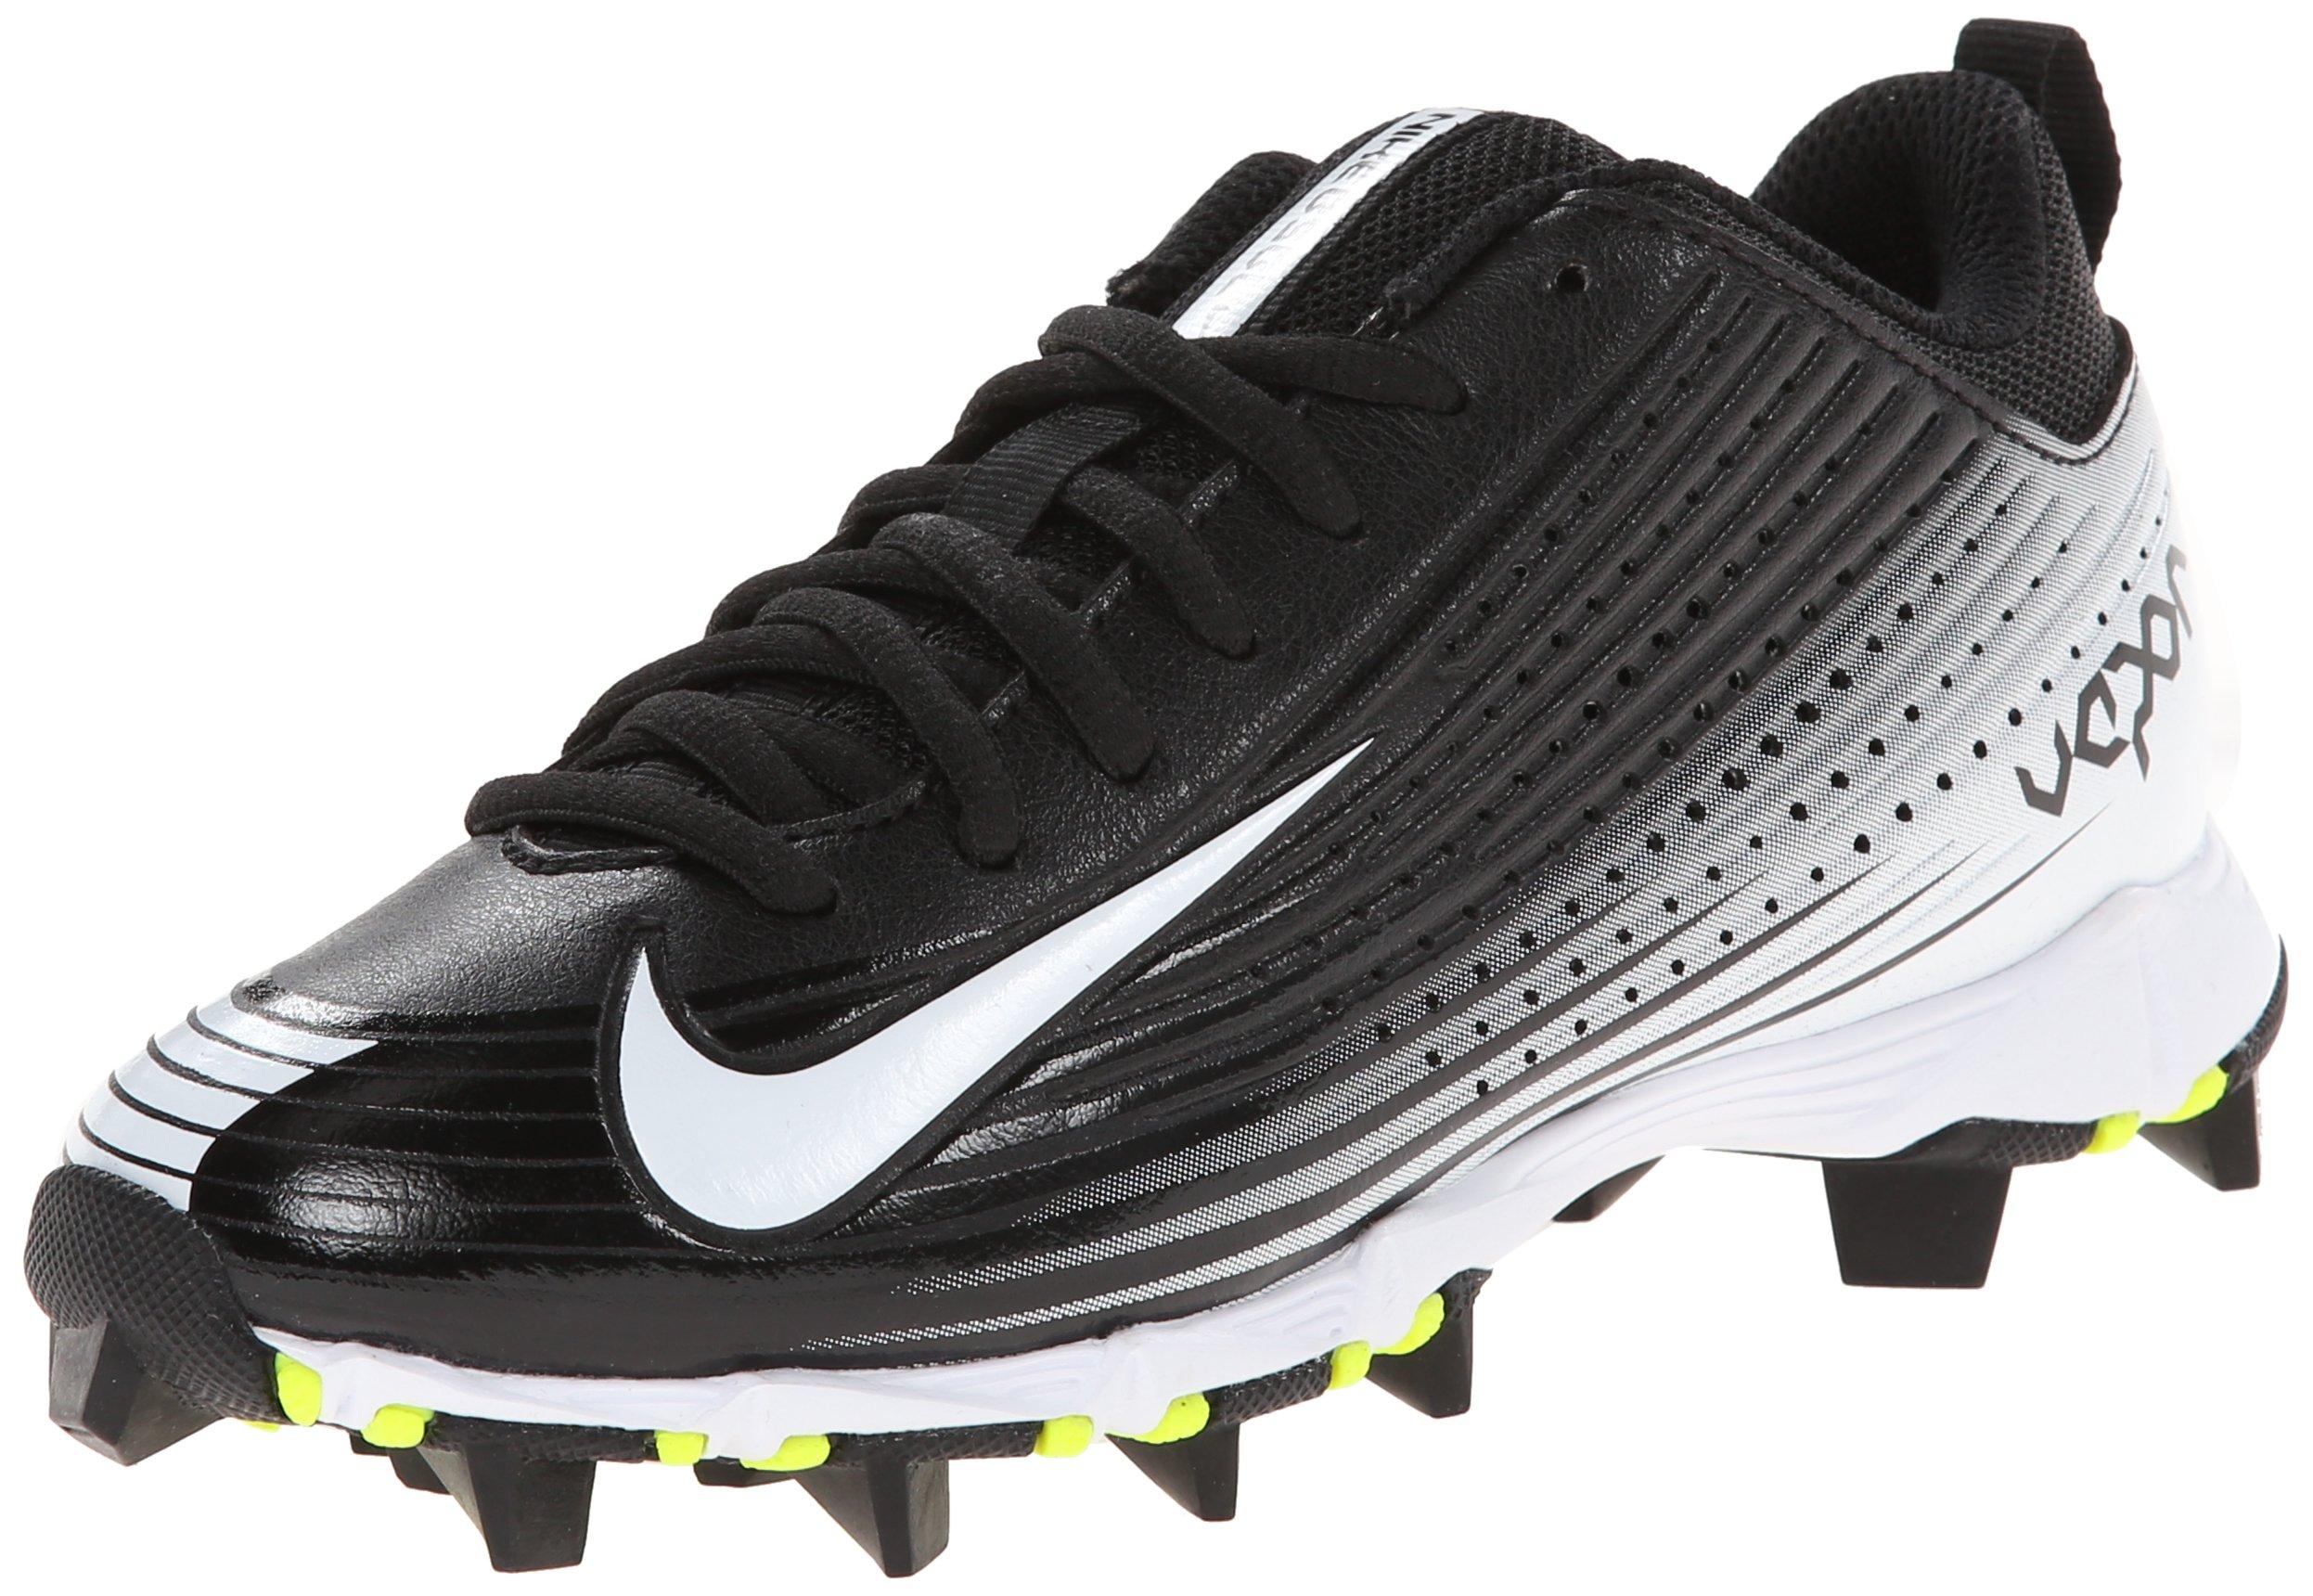 Nike Boy's Vapor Keystone 2 Low (GS) Baseball Cleat Black/White Size 5.5 M US